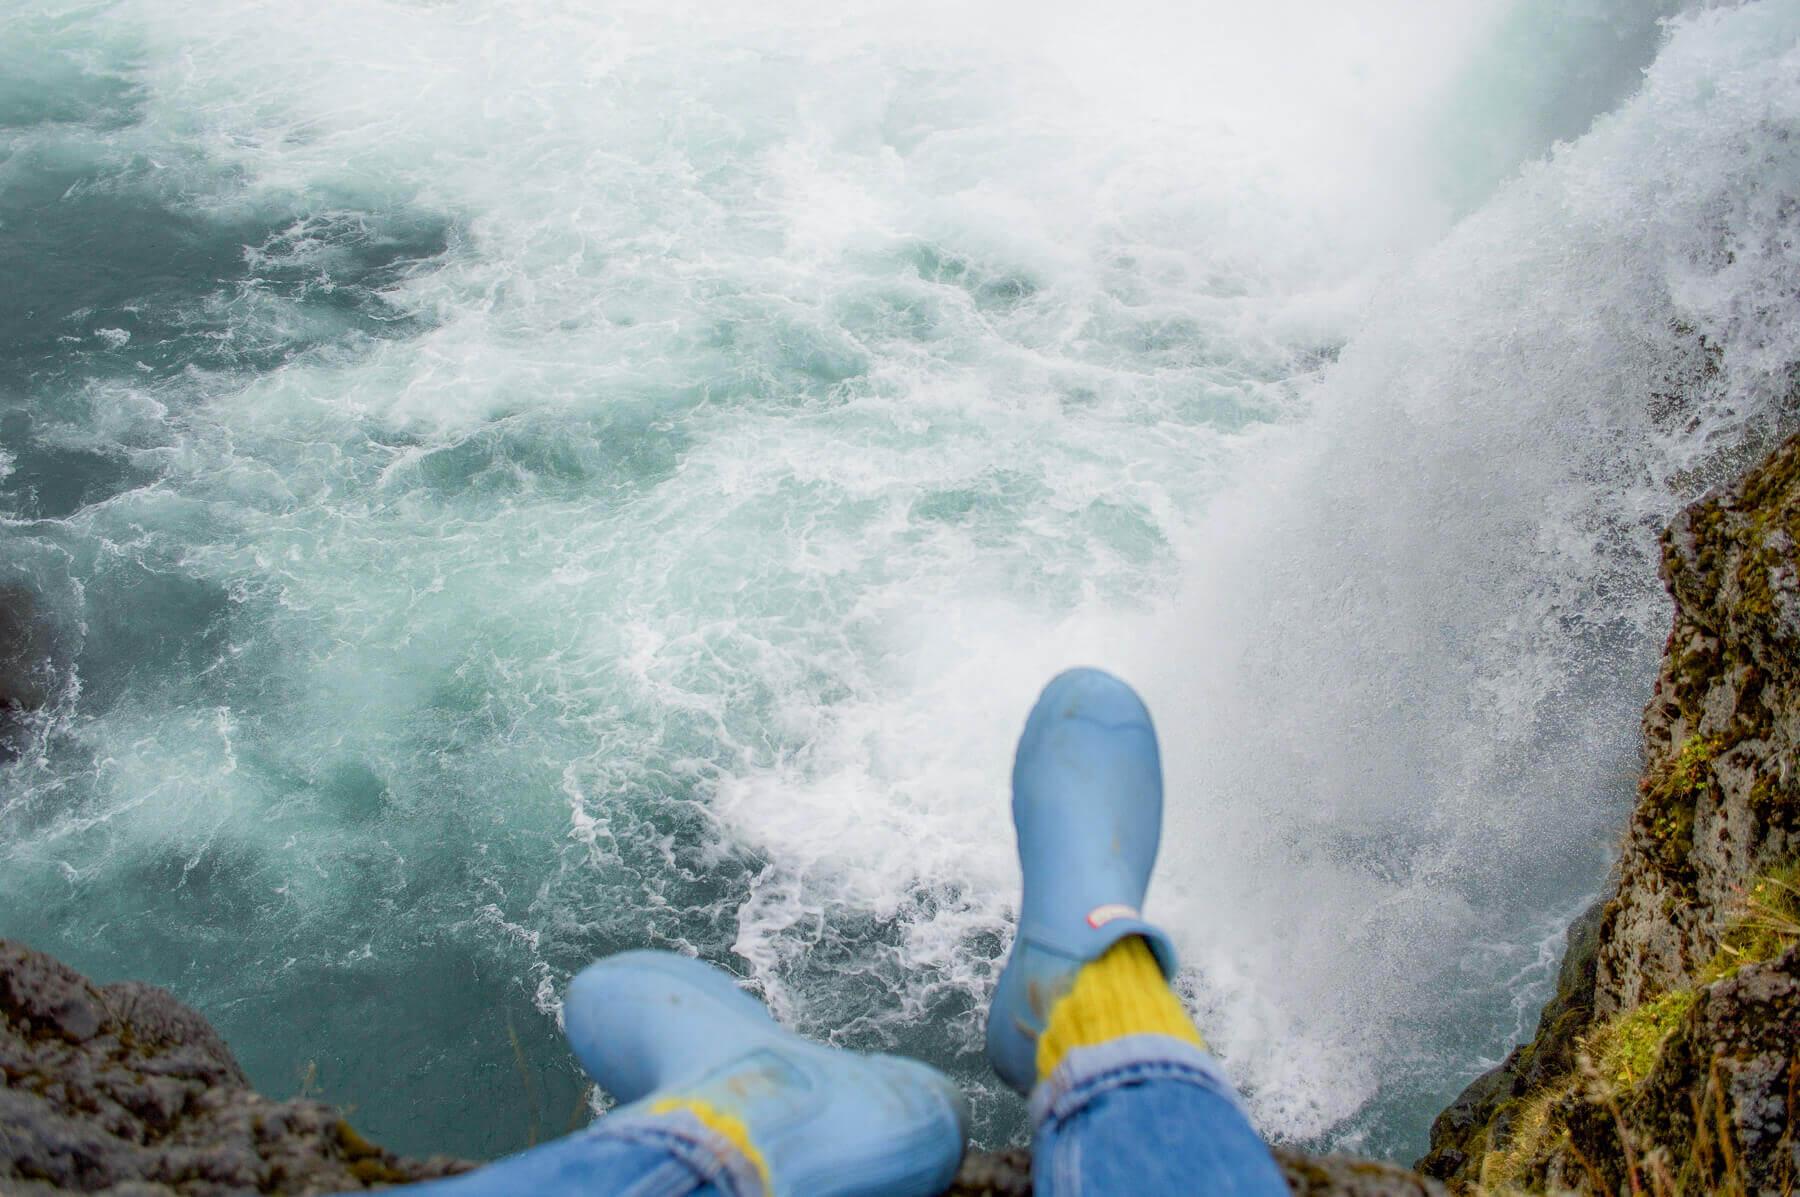 feet hanging over edge of waterfall